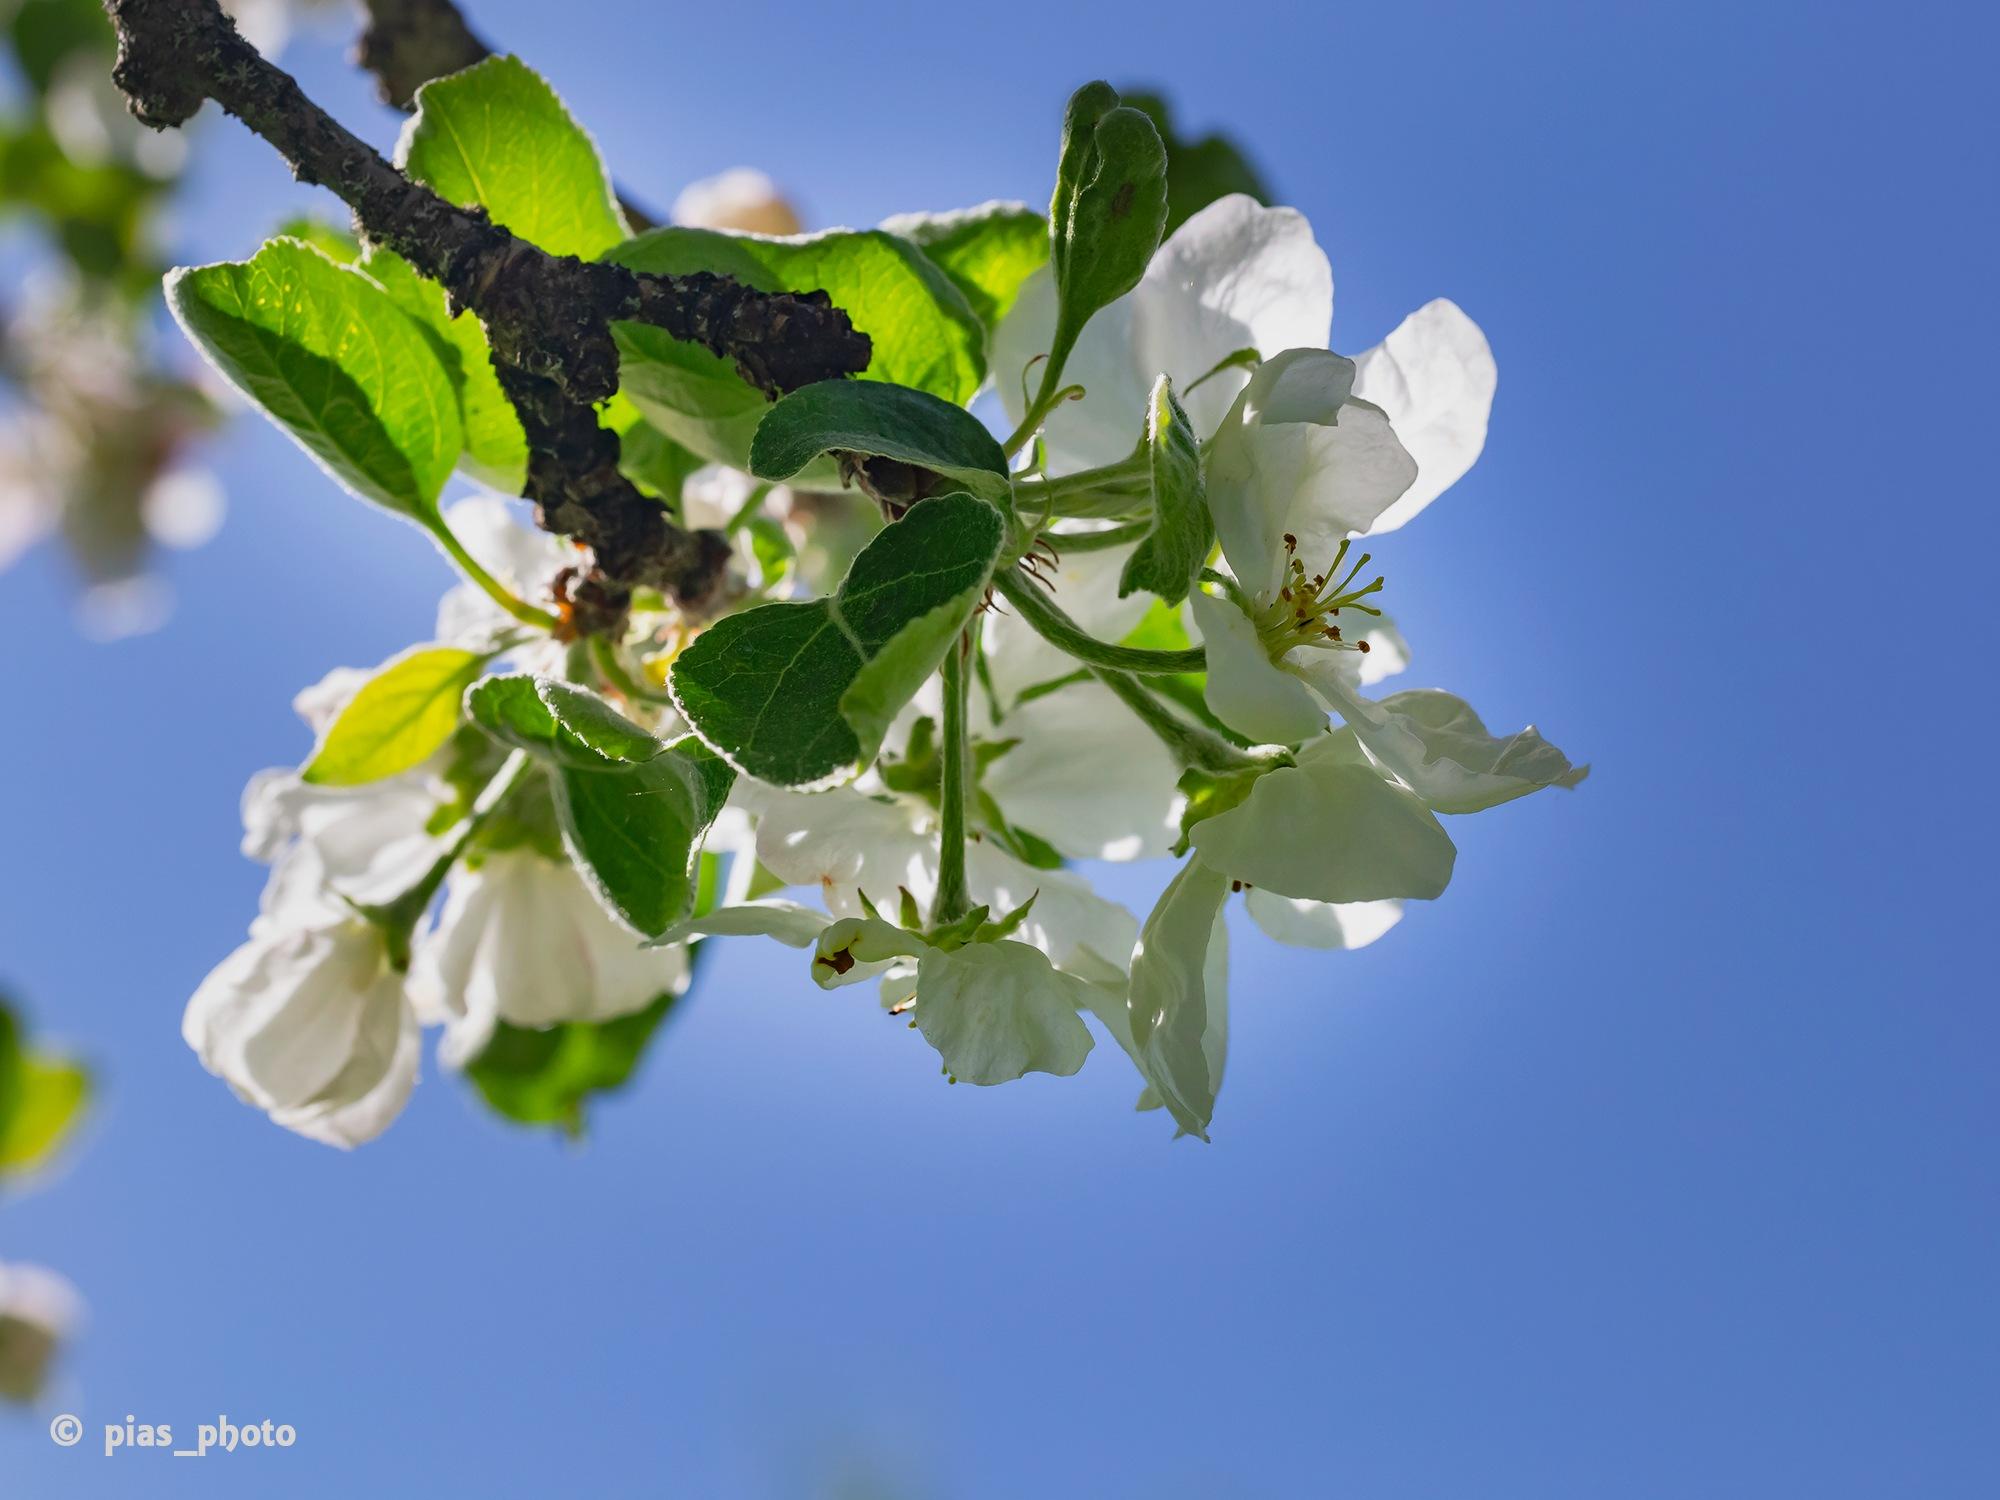 Underbar äppelblom by pias_photo